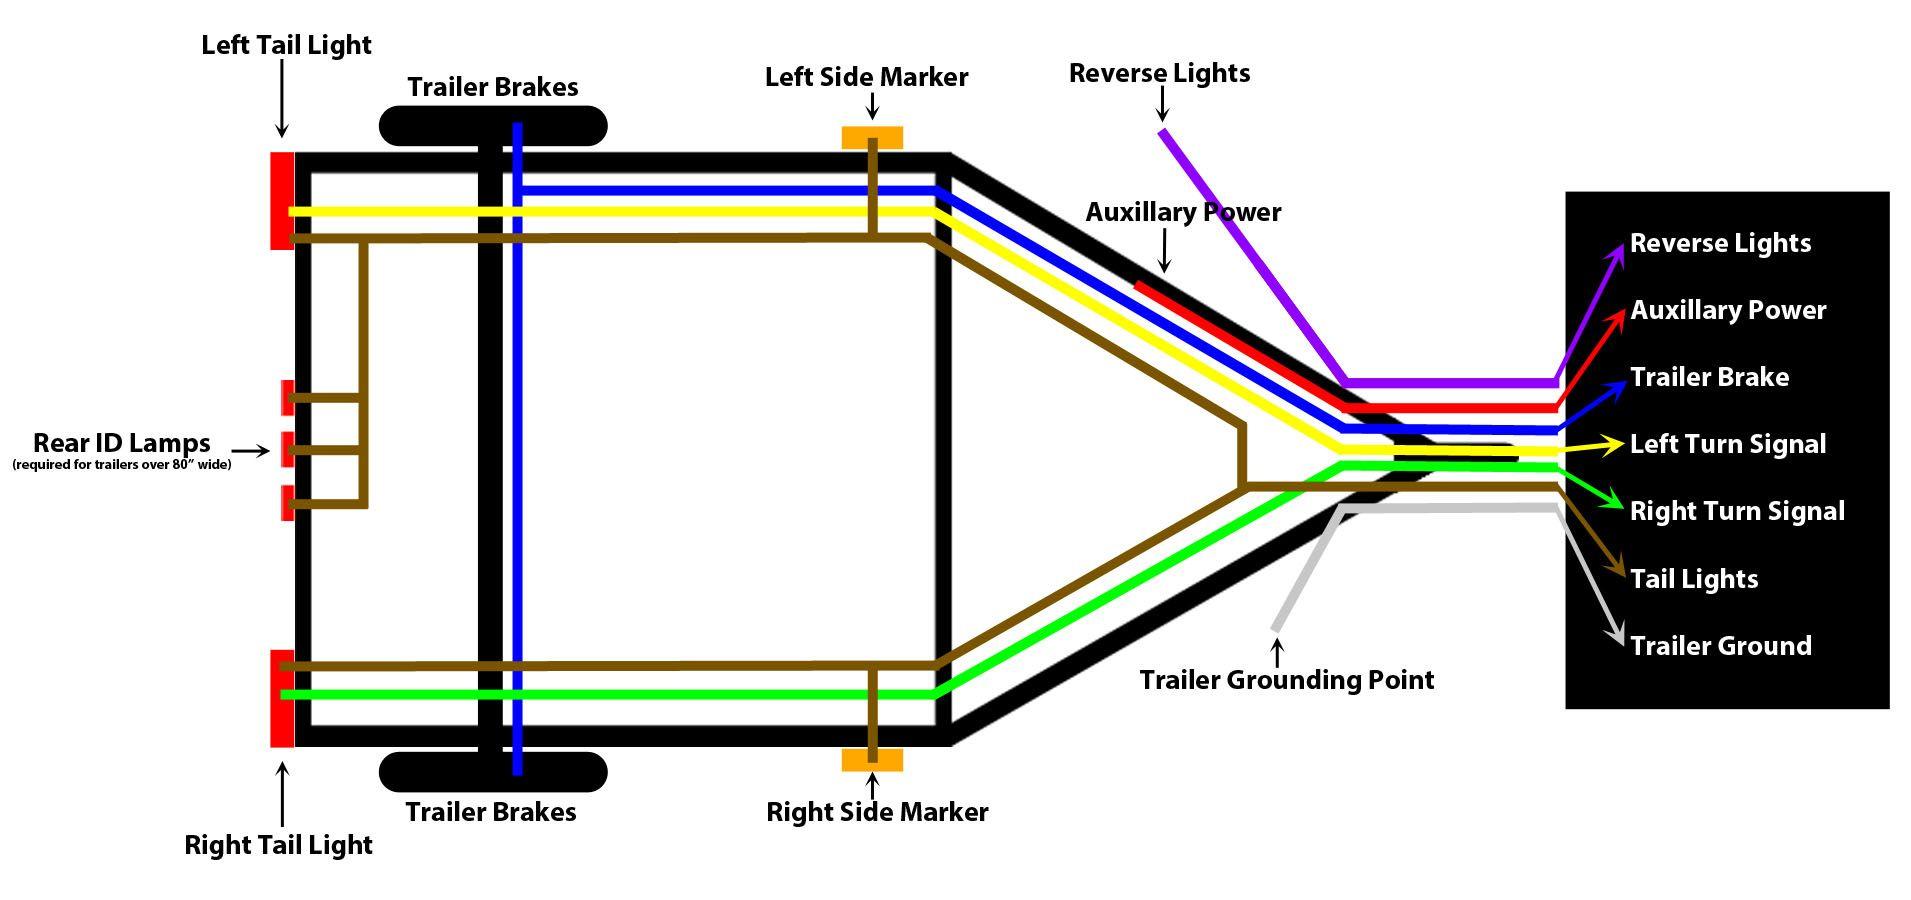 [DIAGRAM_38ZD]  VW_2076] Vdo Gauge Wiring Diagram Together With Pj Dump Trailer Wiring  Diagram Free Diagram | Belmont Trailer Wiring Diagram |  | Weveq Rele Mohammedshrine Librar Wiring 101